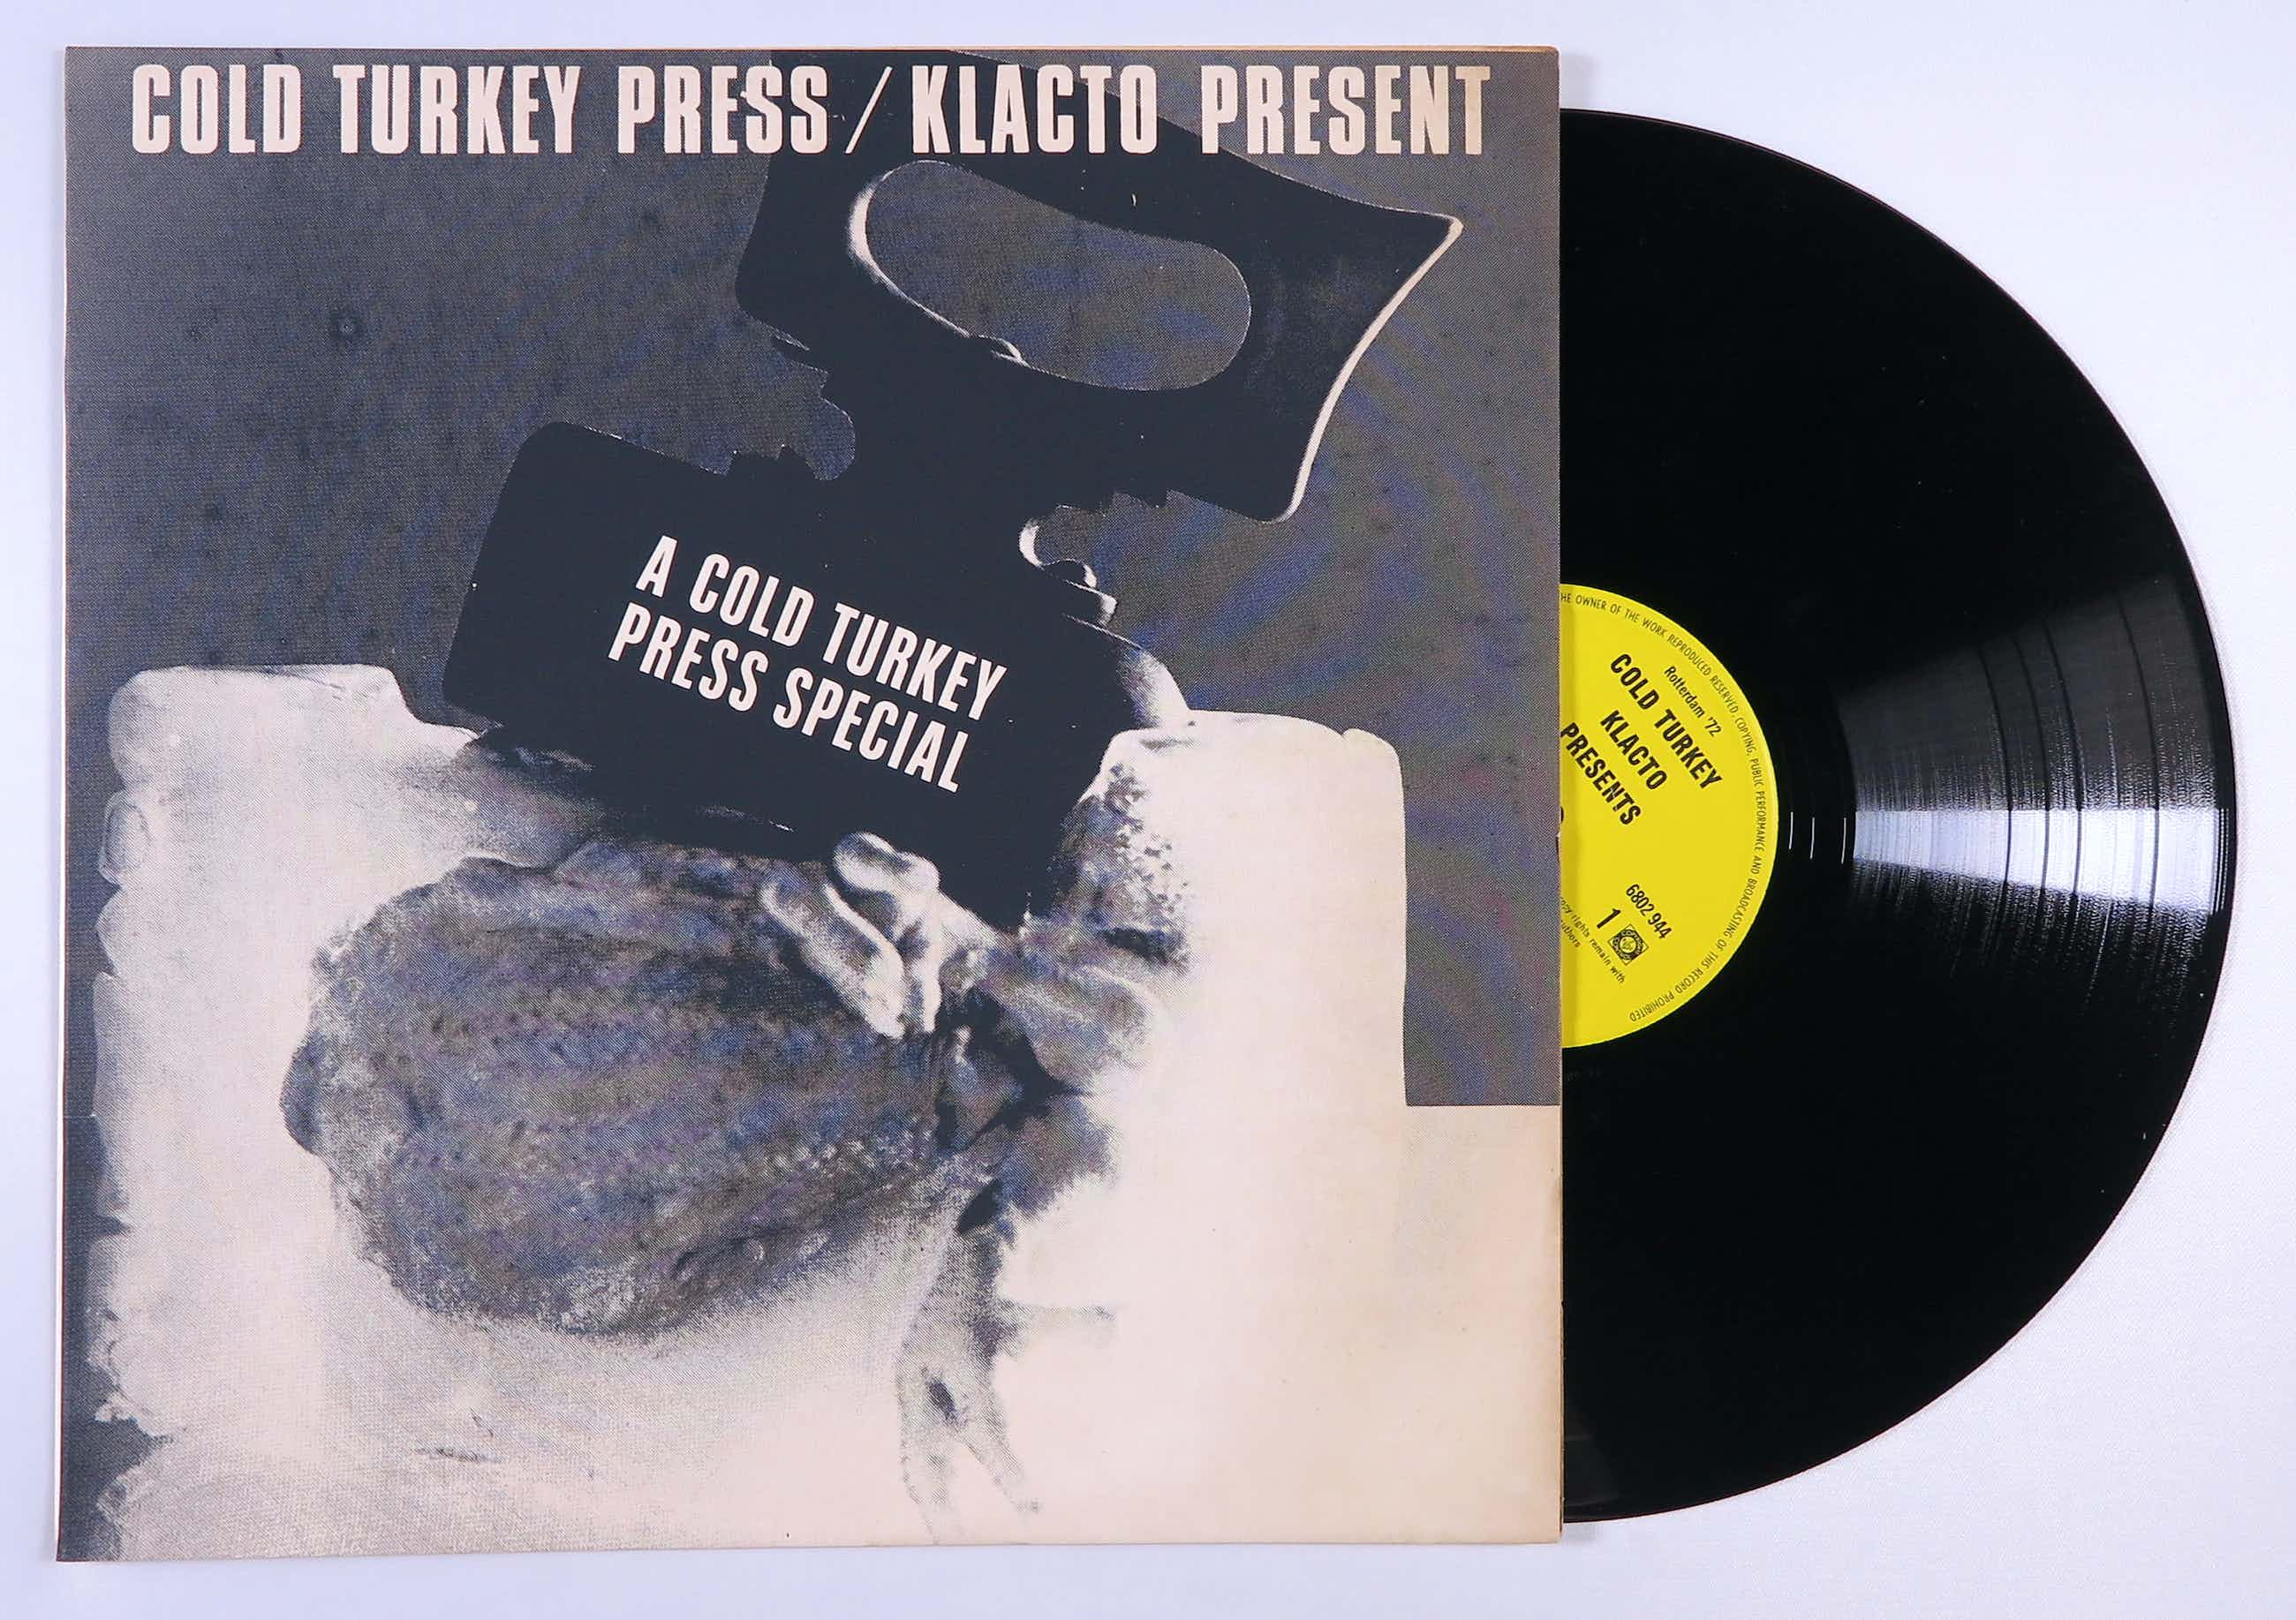 Cold Turkey Press - Klacto Present (A Cold Turkey Press Special) kopen? Bied vanaf 20!